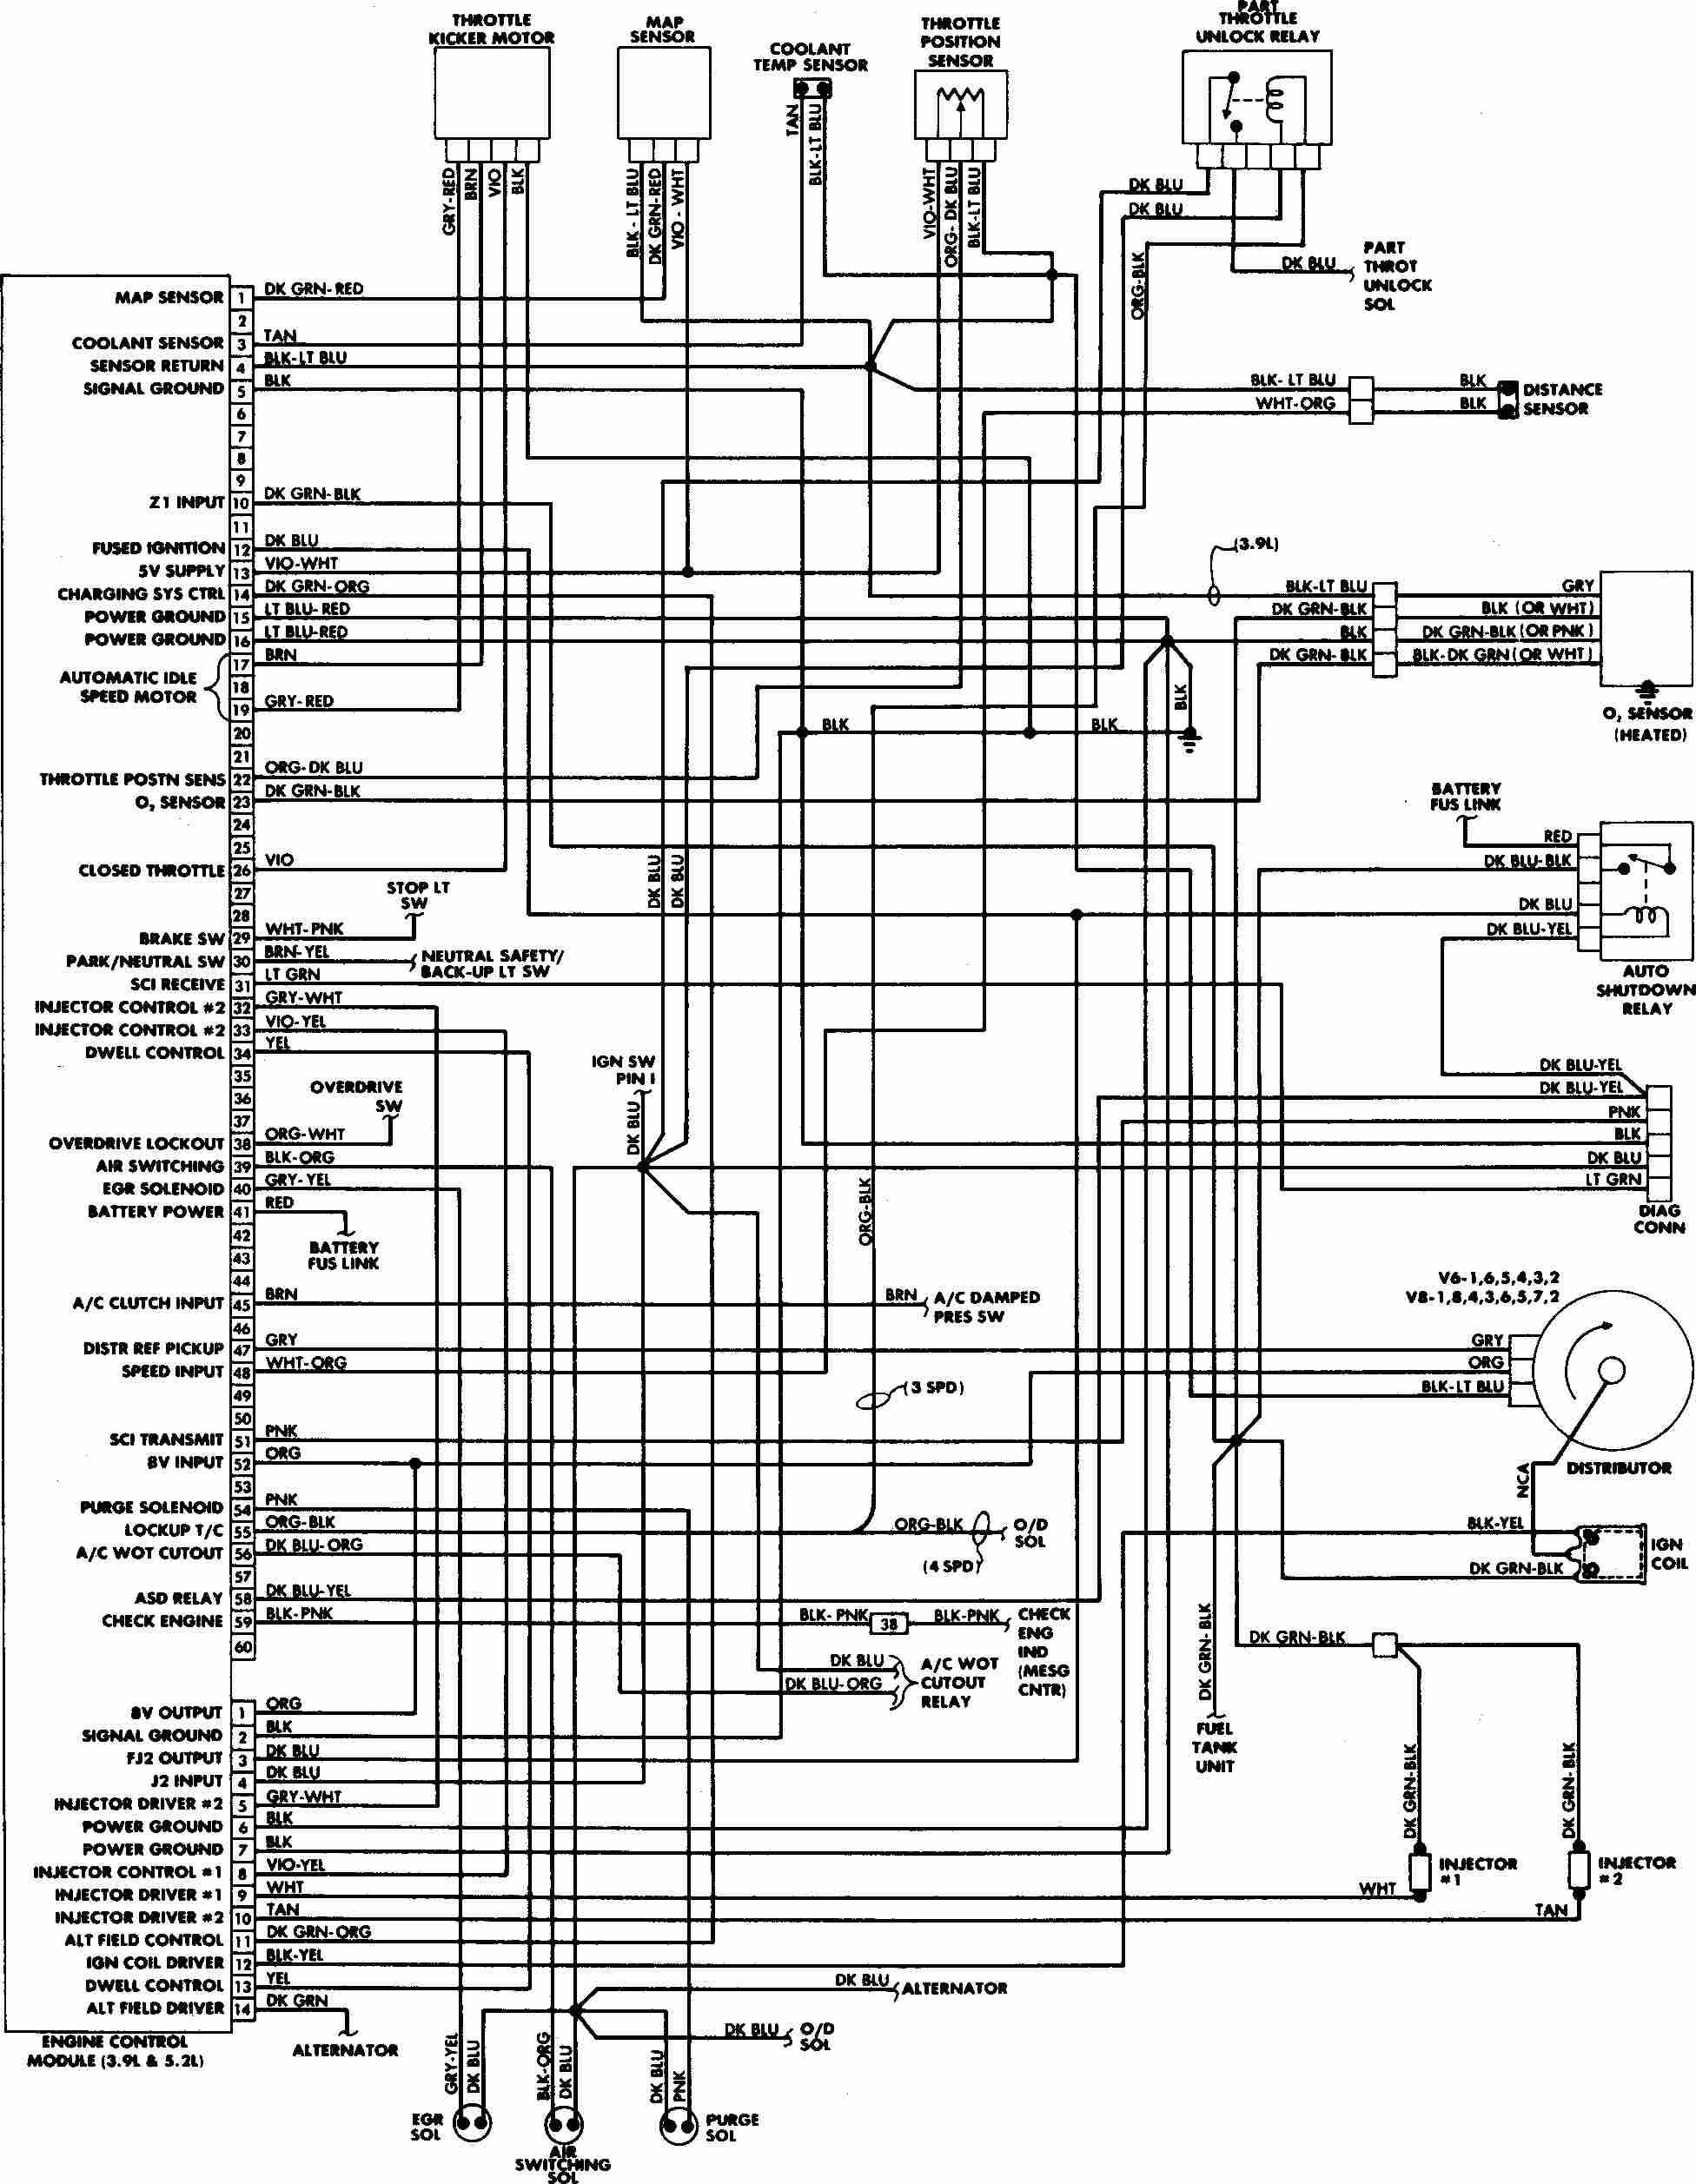 dodge durango abs module wiring harness diagram